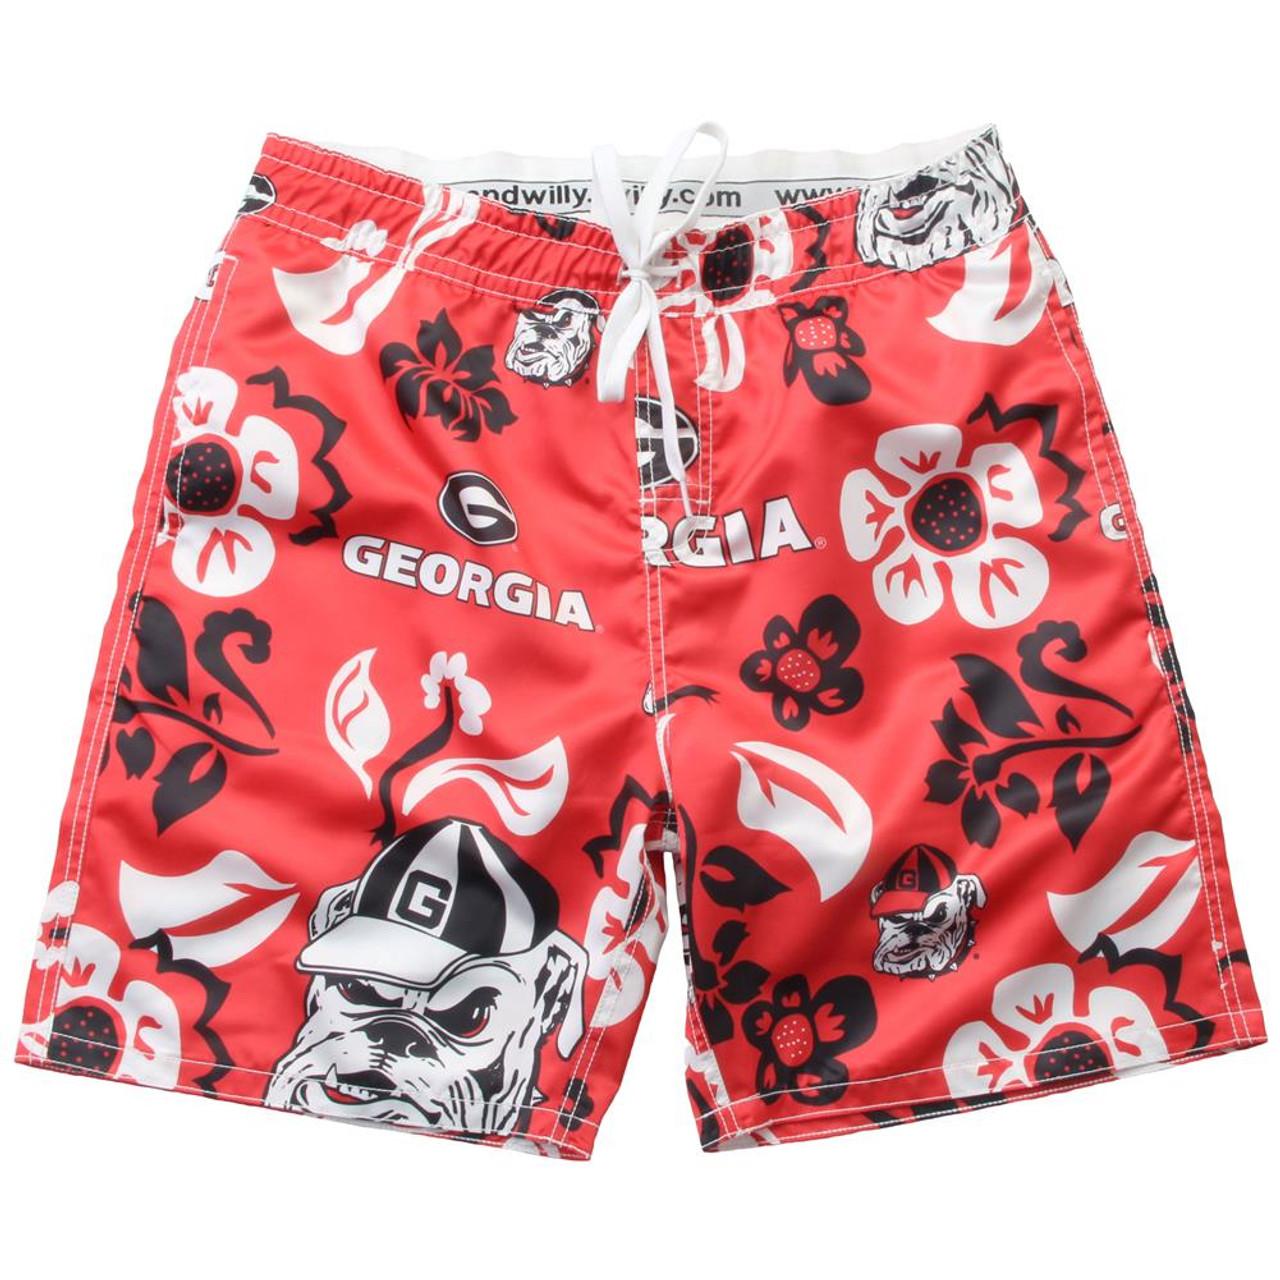 Men's Georgia Bulldogs UGA Swim Trunks Floral Swim Shorts